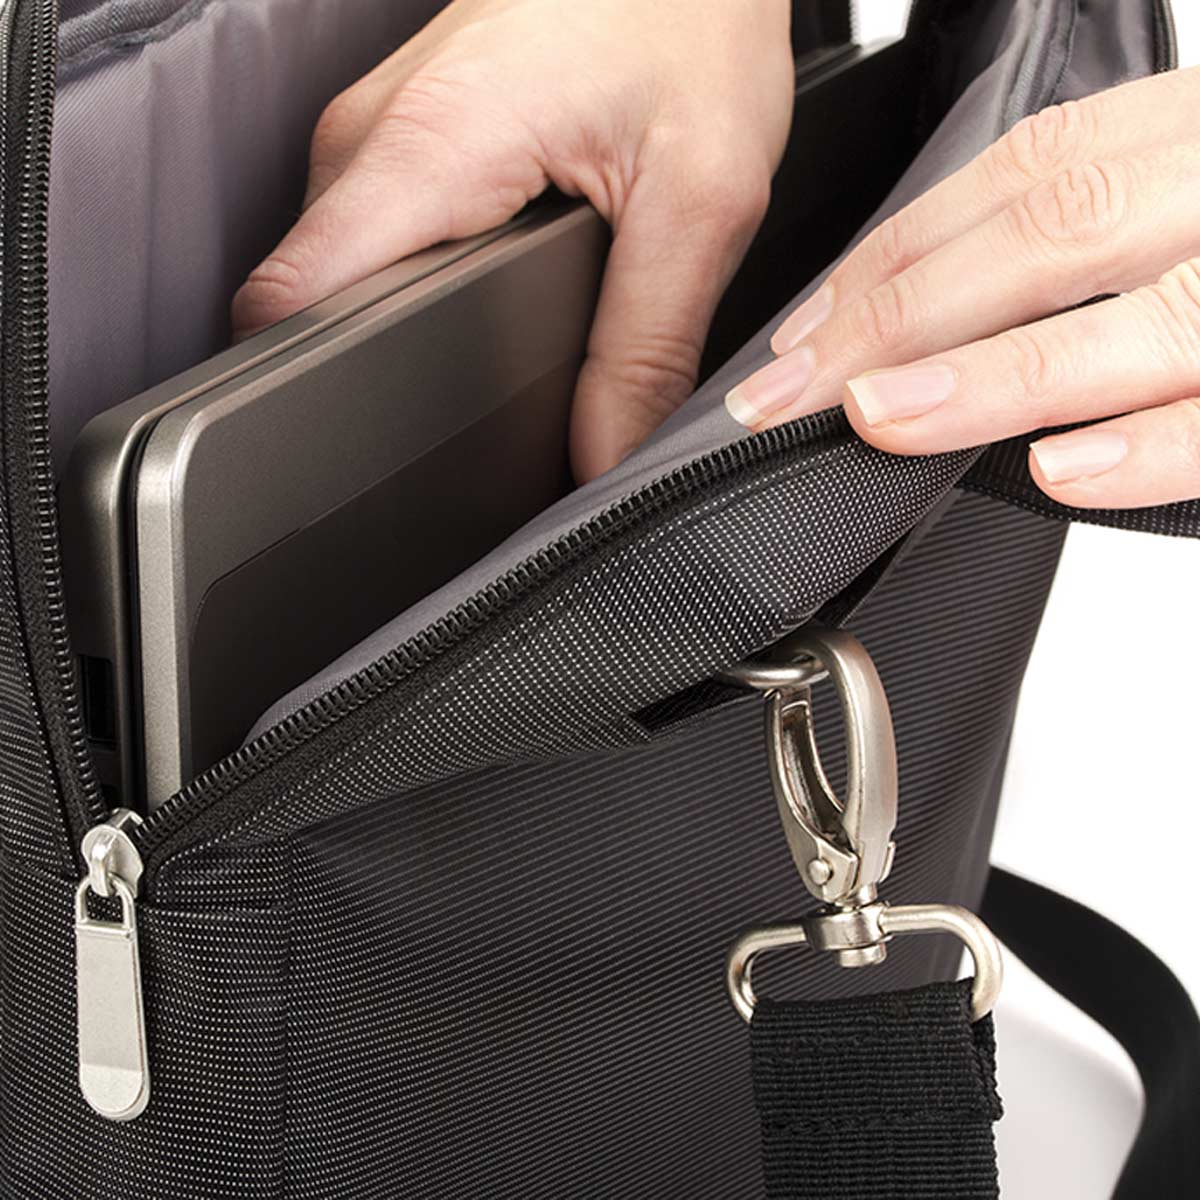 Laptop-Bag – 2015-01 (approx. 39 x 31 x 5 cm, black)